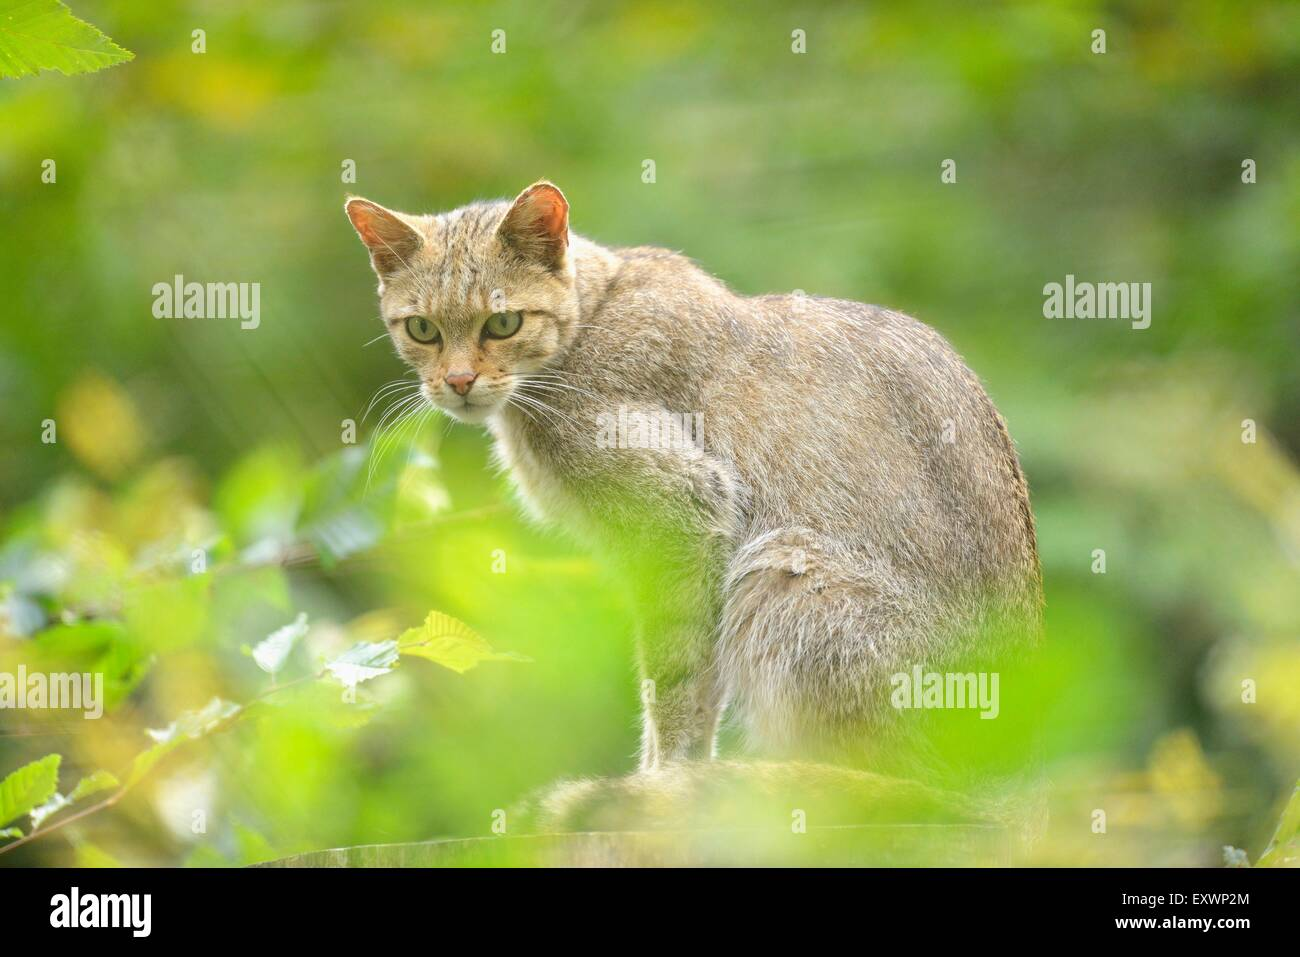 European wildcat - Stock Image